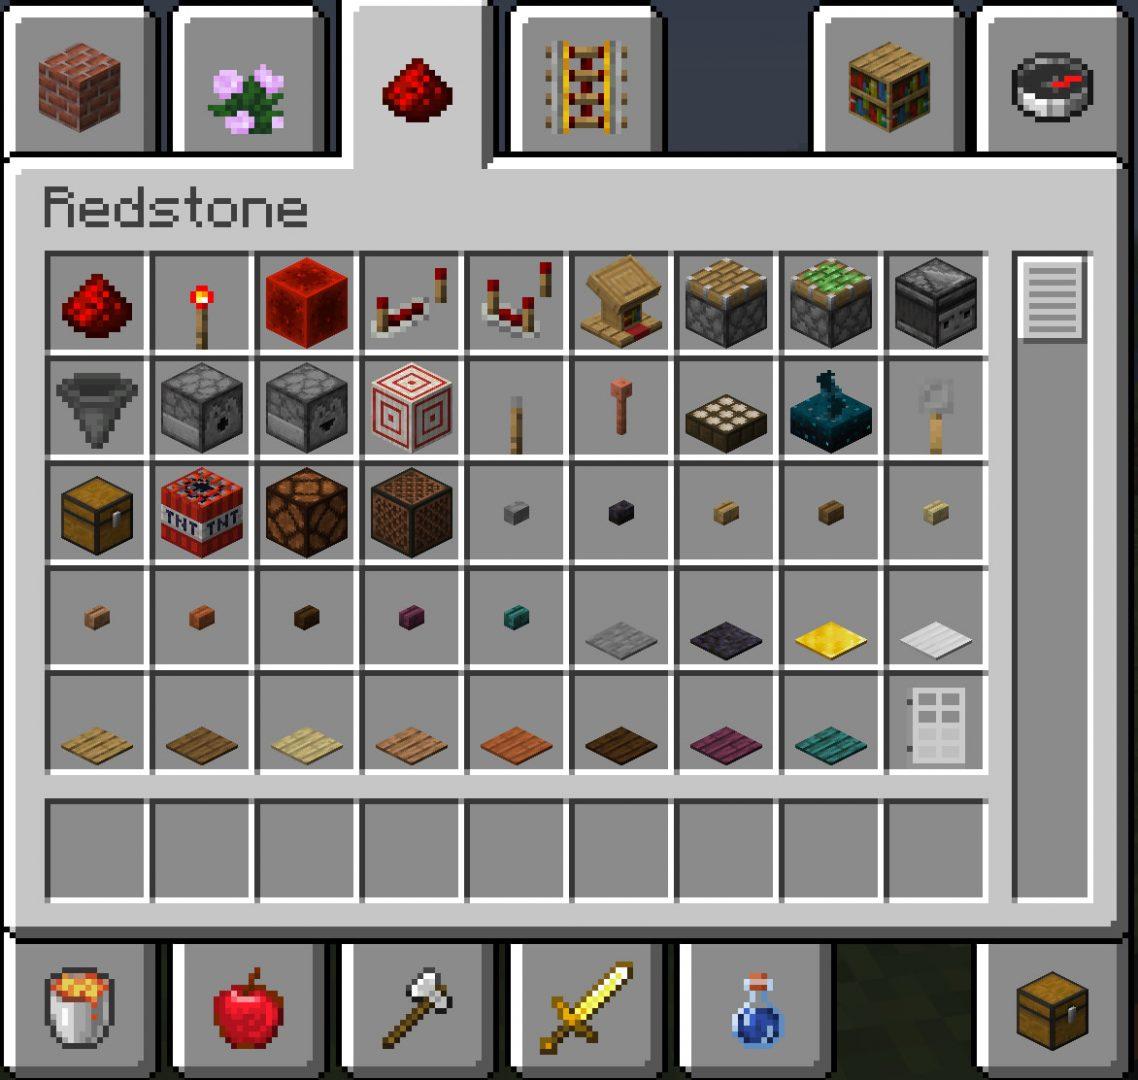 Inventaire redstone créatif